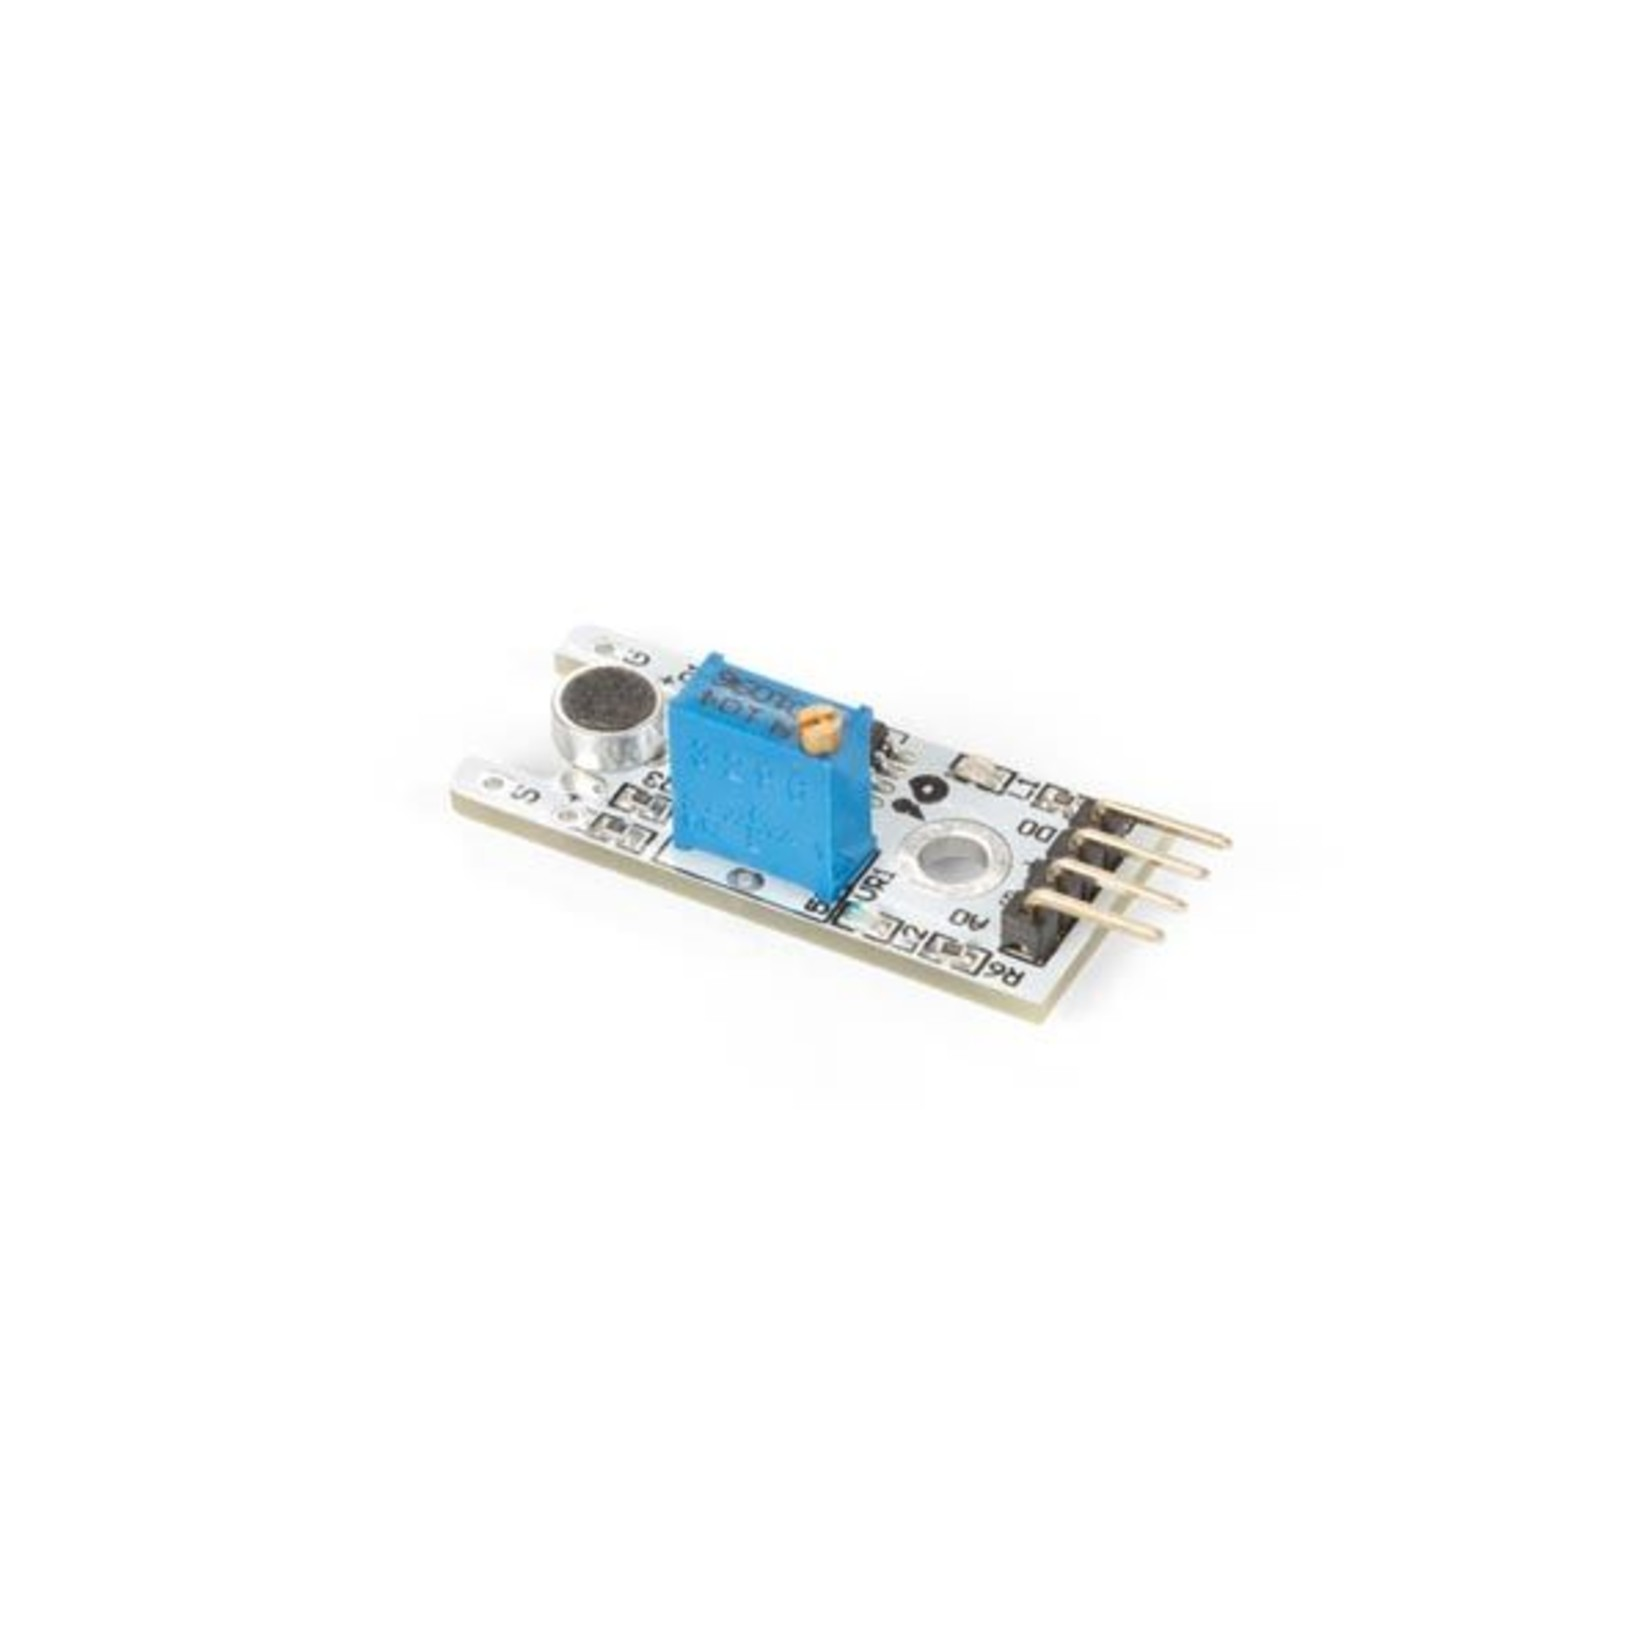 Velleman ARDUINO® compatible microphone sound sensor